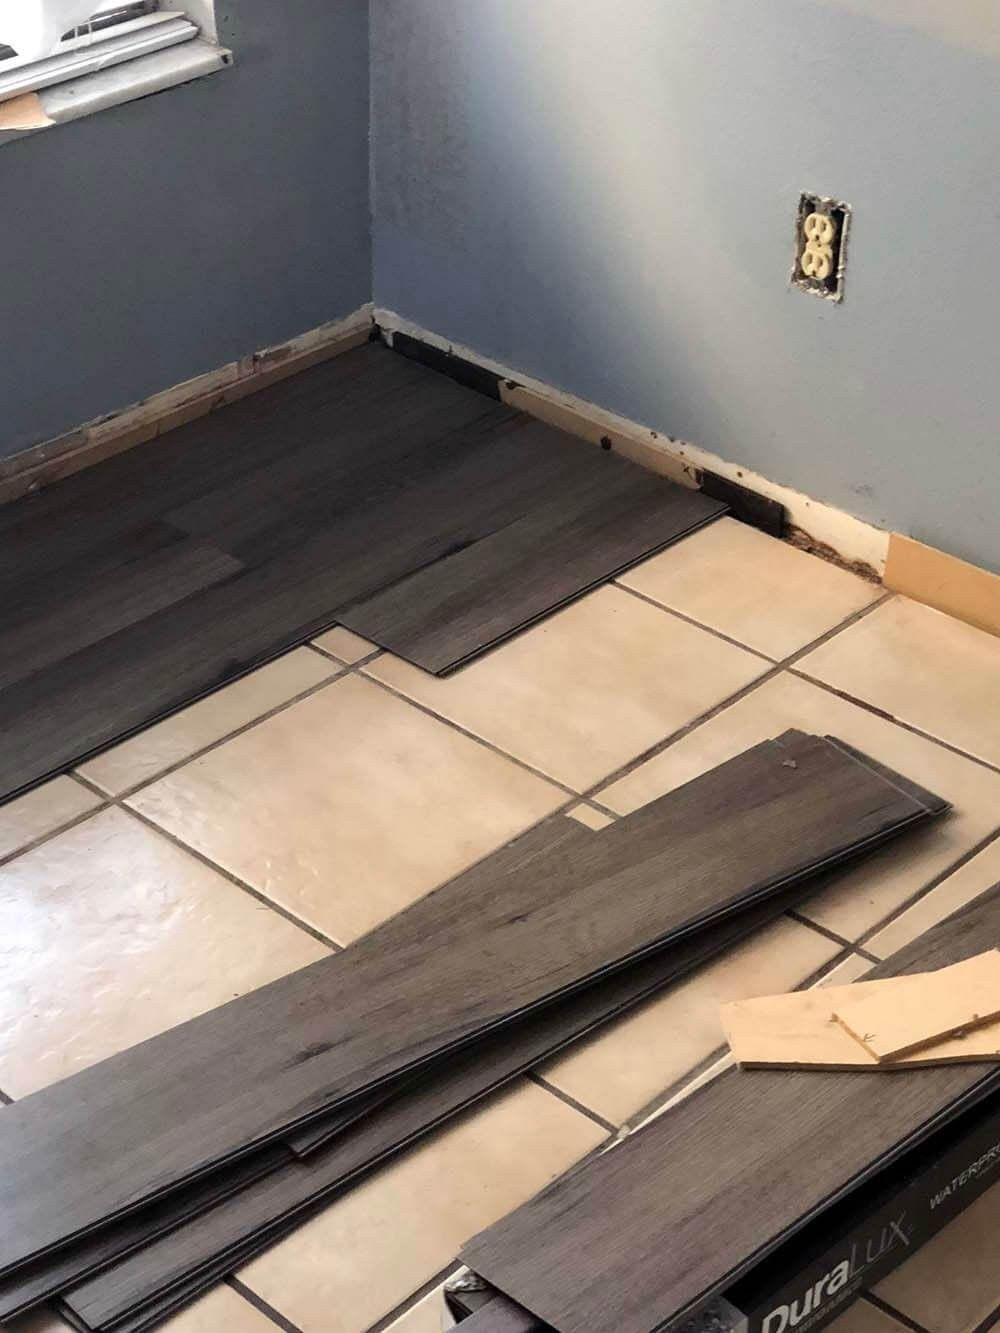 Lvt Tiles Over Ceramic Tile The Supplies To Lay The Floor Myself Duralux Lux Luxury Vinyl Plank Flooring Kitchen Luxury Vinyl Plank Luxury Vinyl Tile Kitchen